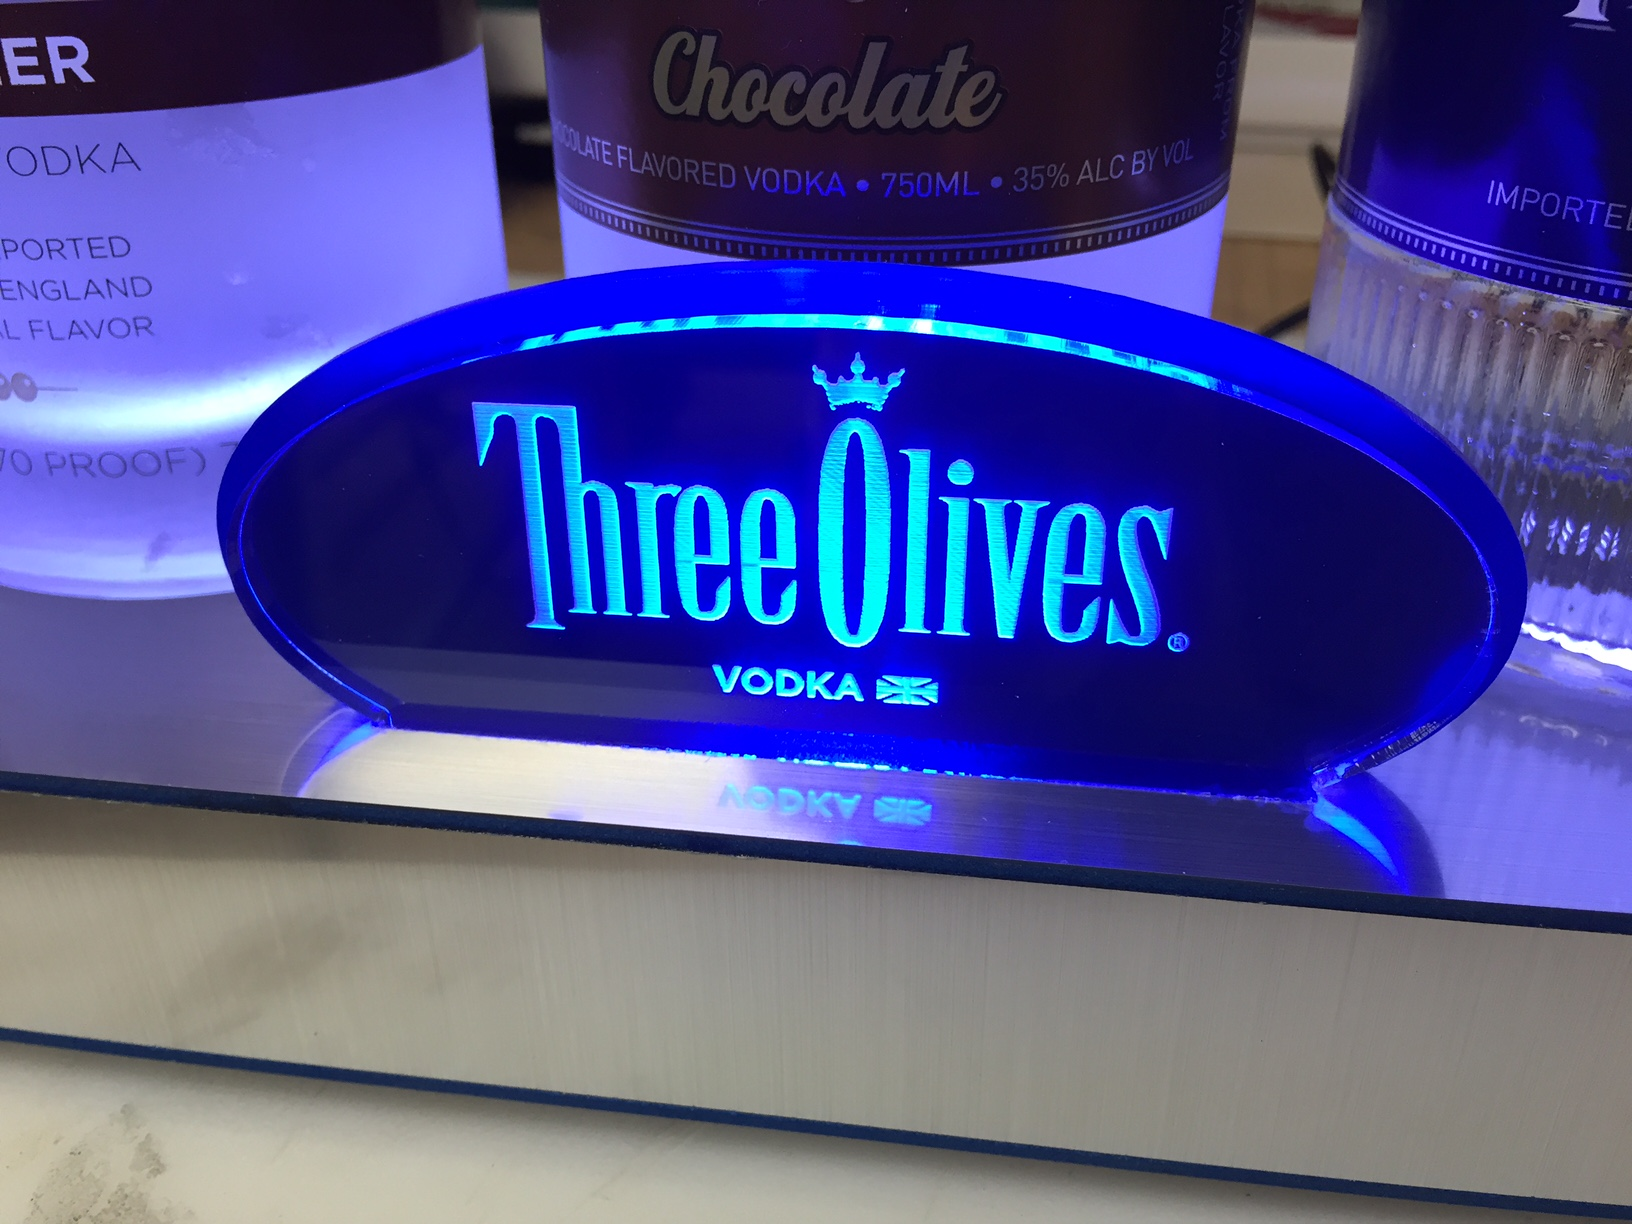 THREE OLIVES GLORIFIER